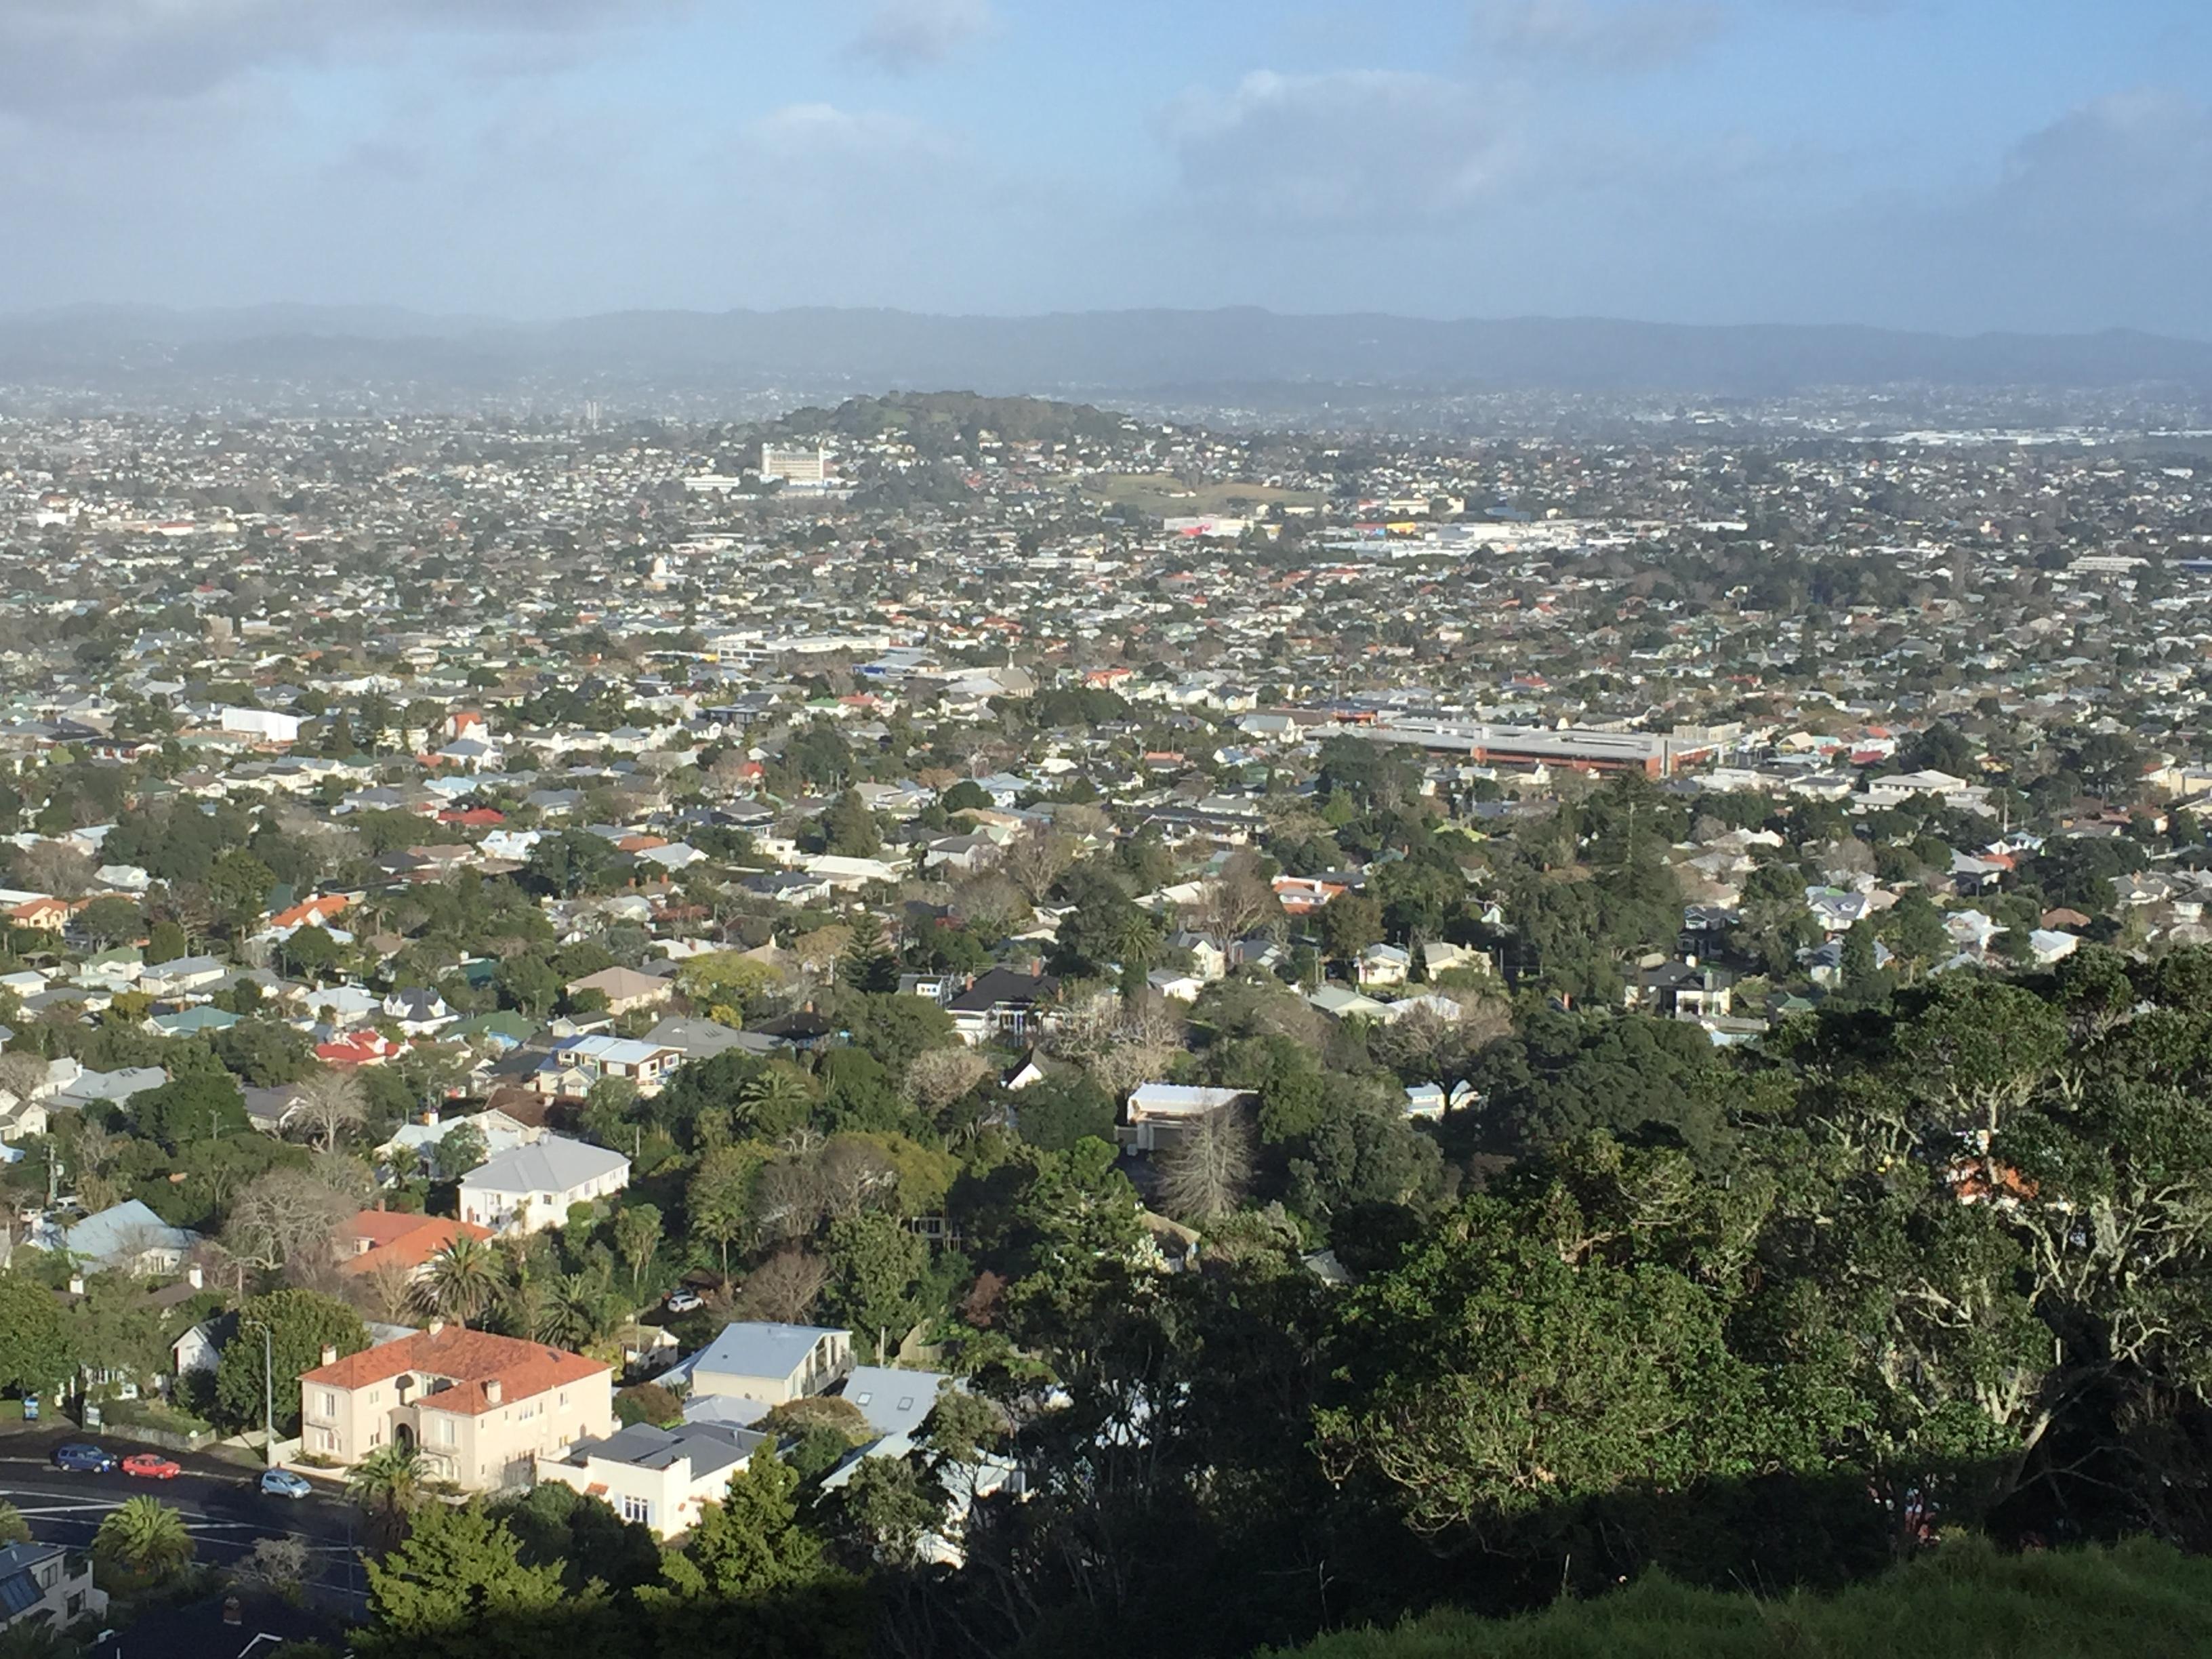 Tūpuna Maunga Authority: reflections from City Vision's Glenda Fryer